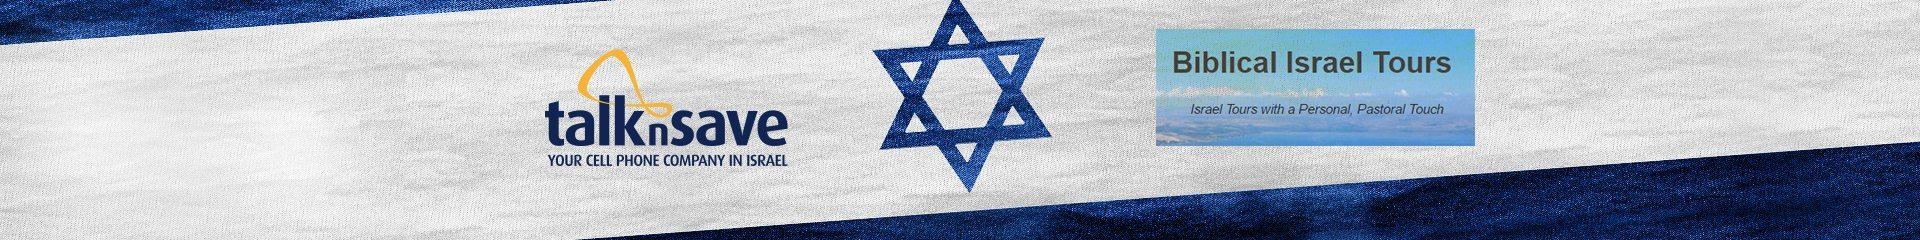 biblical-israel-tours-banner